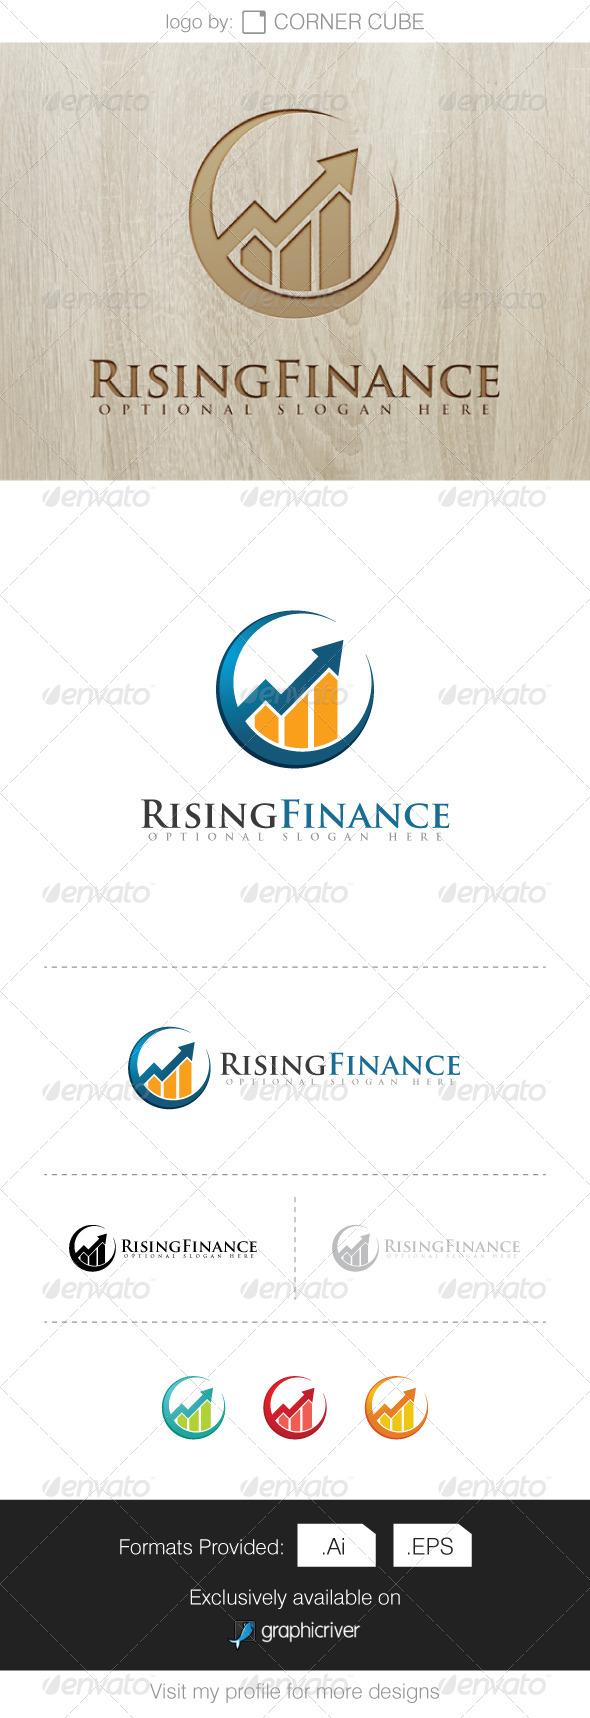 GraphicRiver Rising Finance Logo 8068207